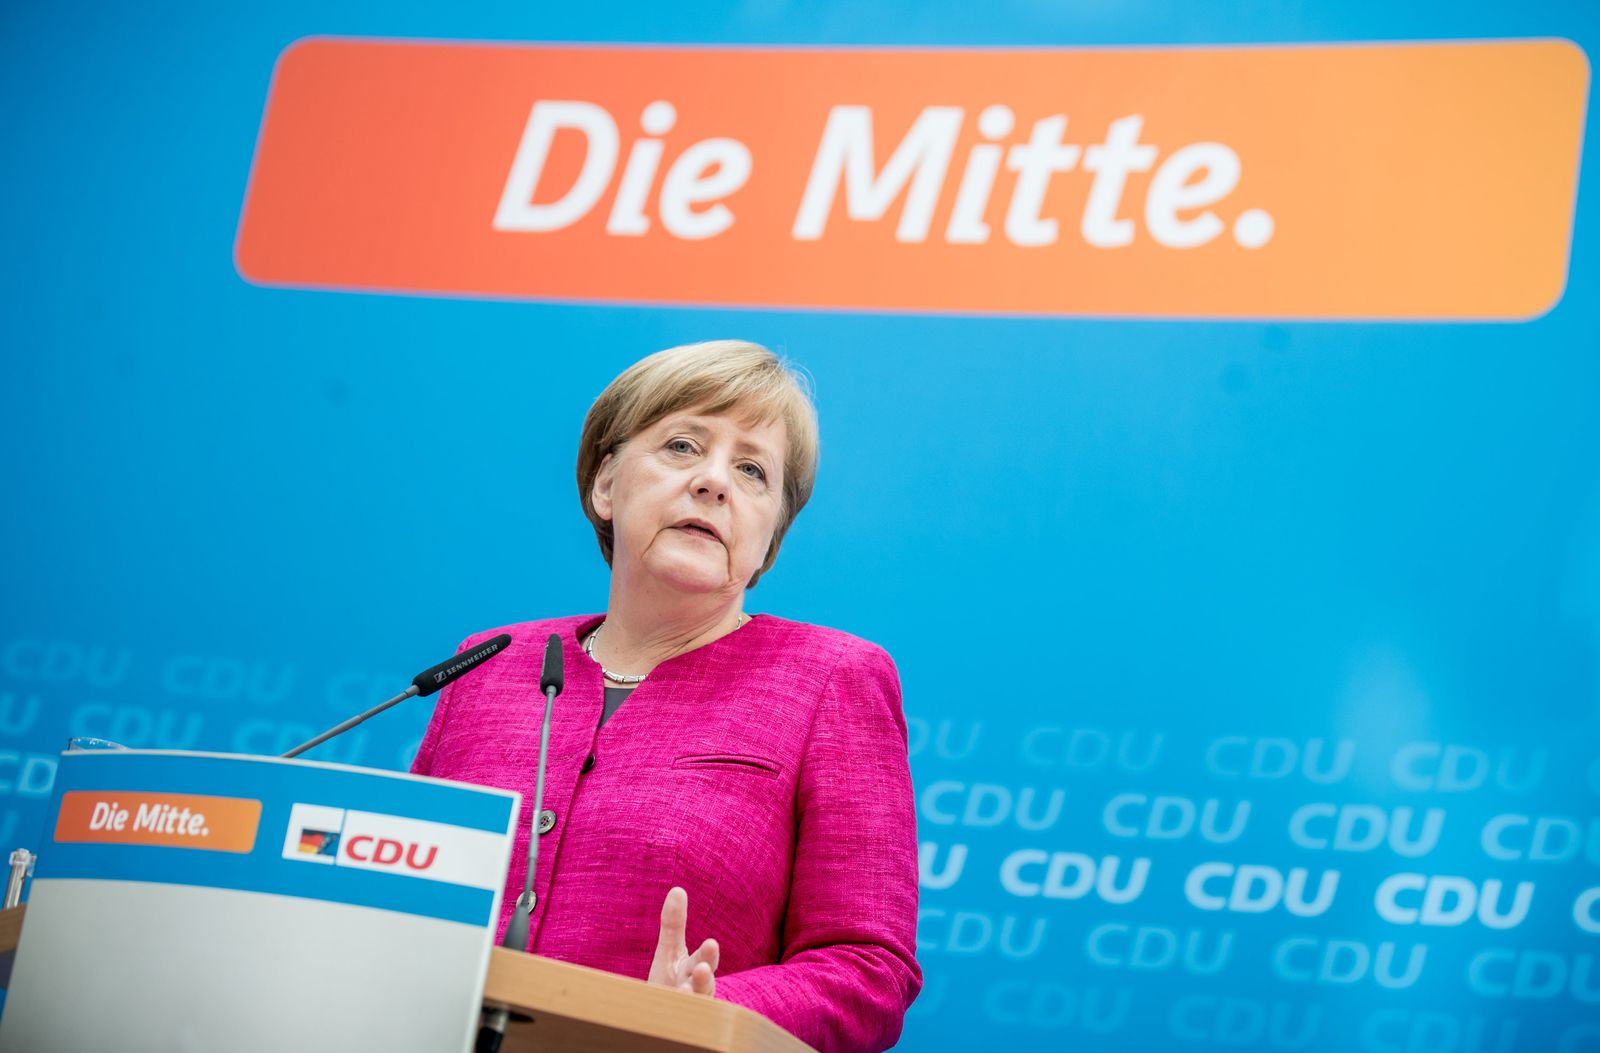 Merkel NRW CDU